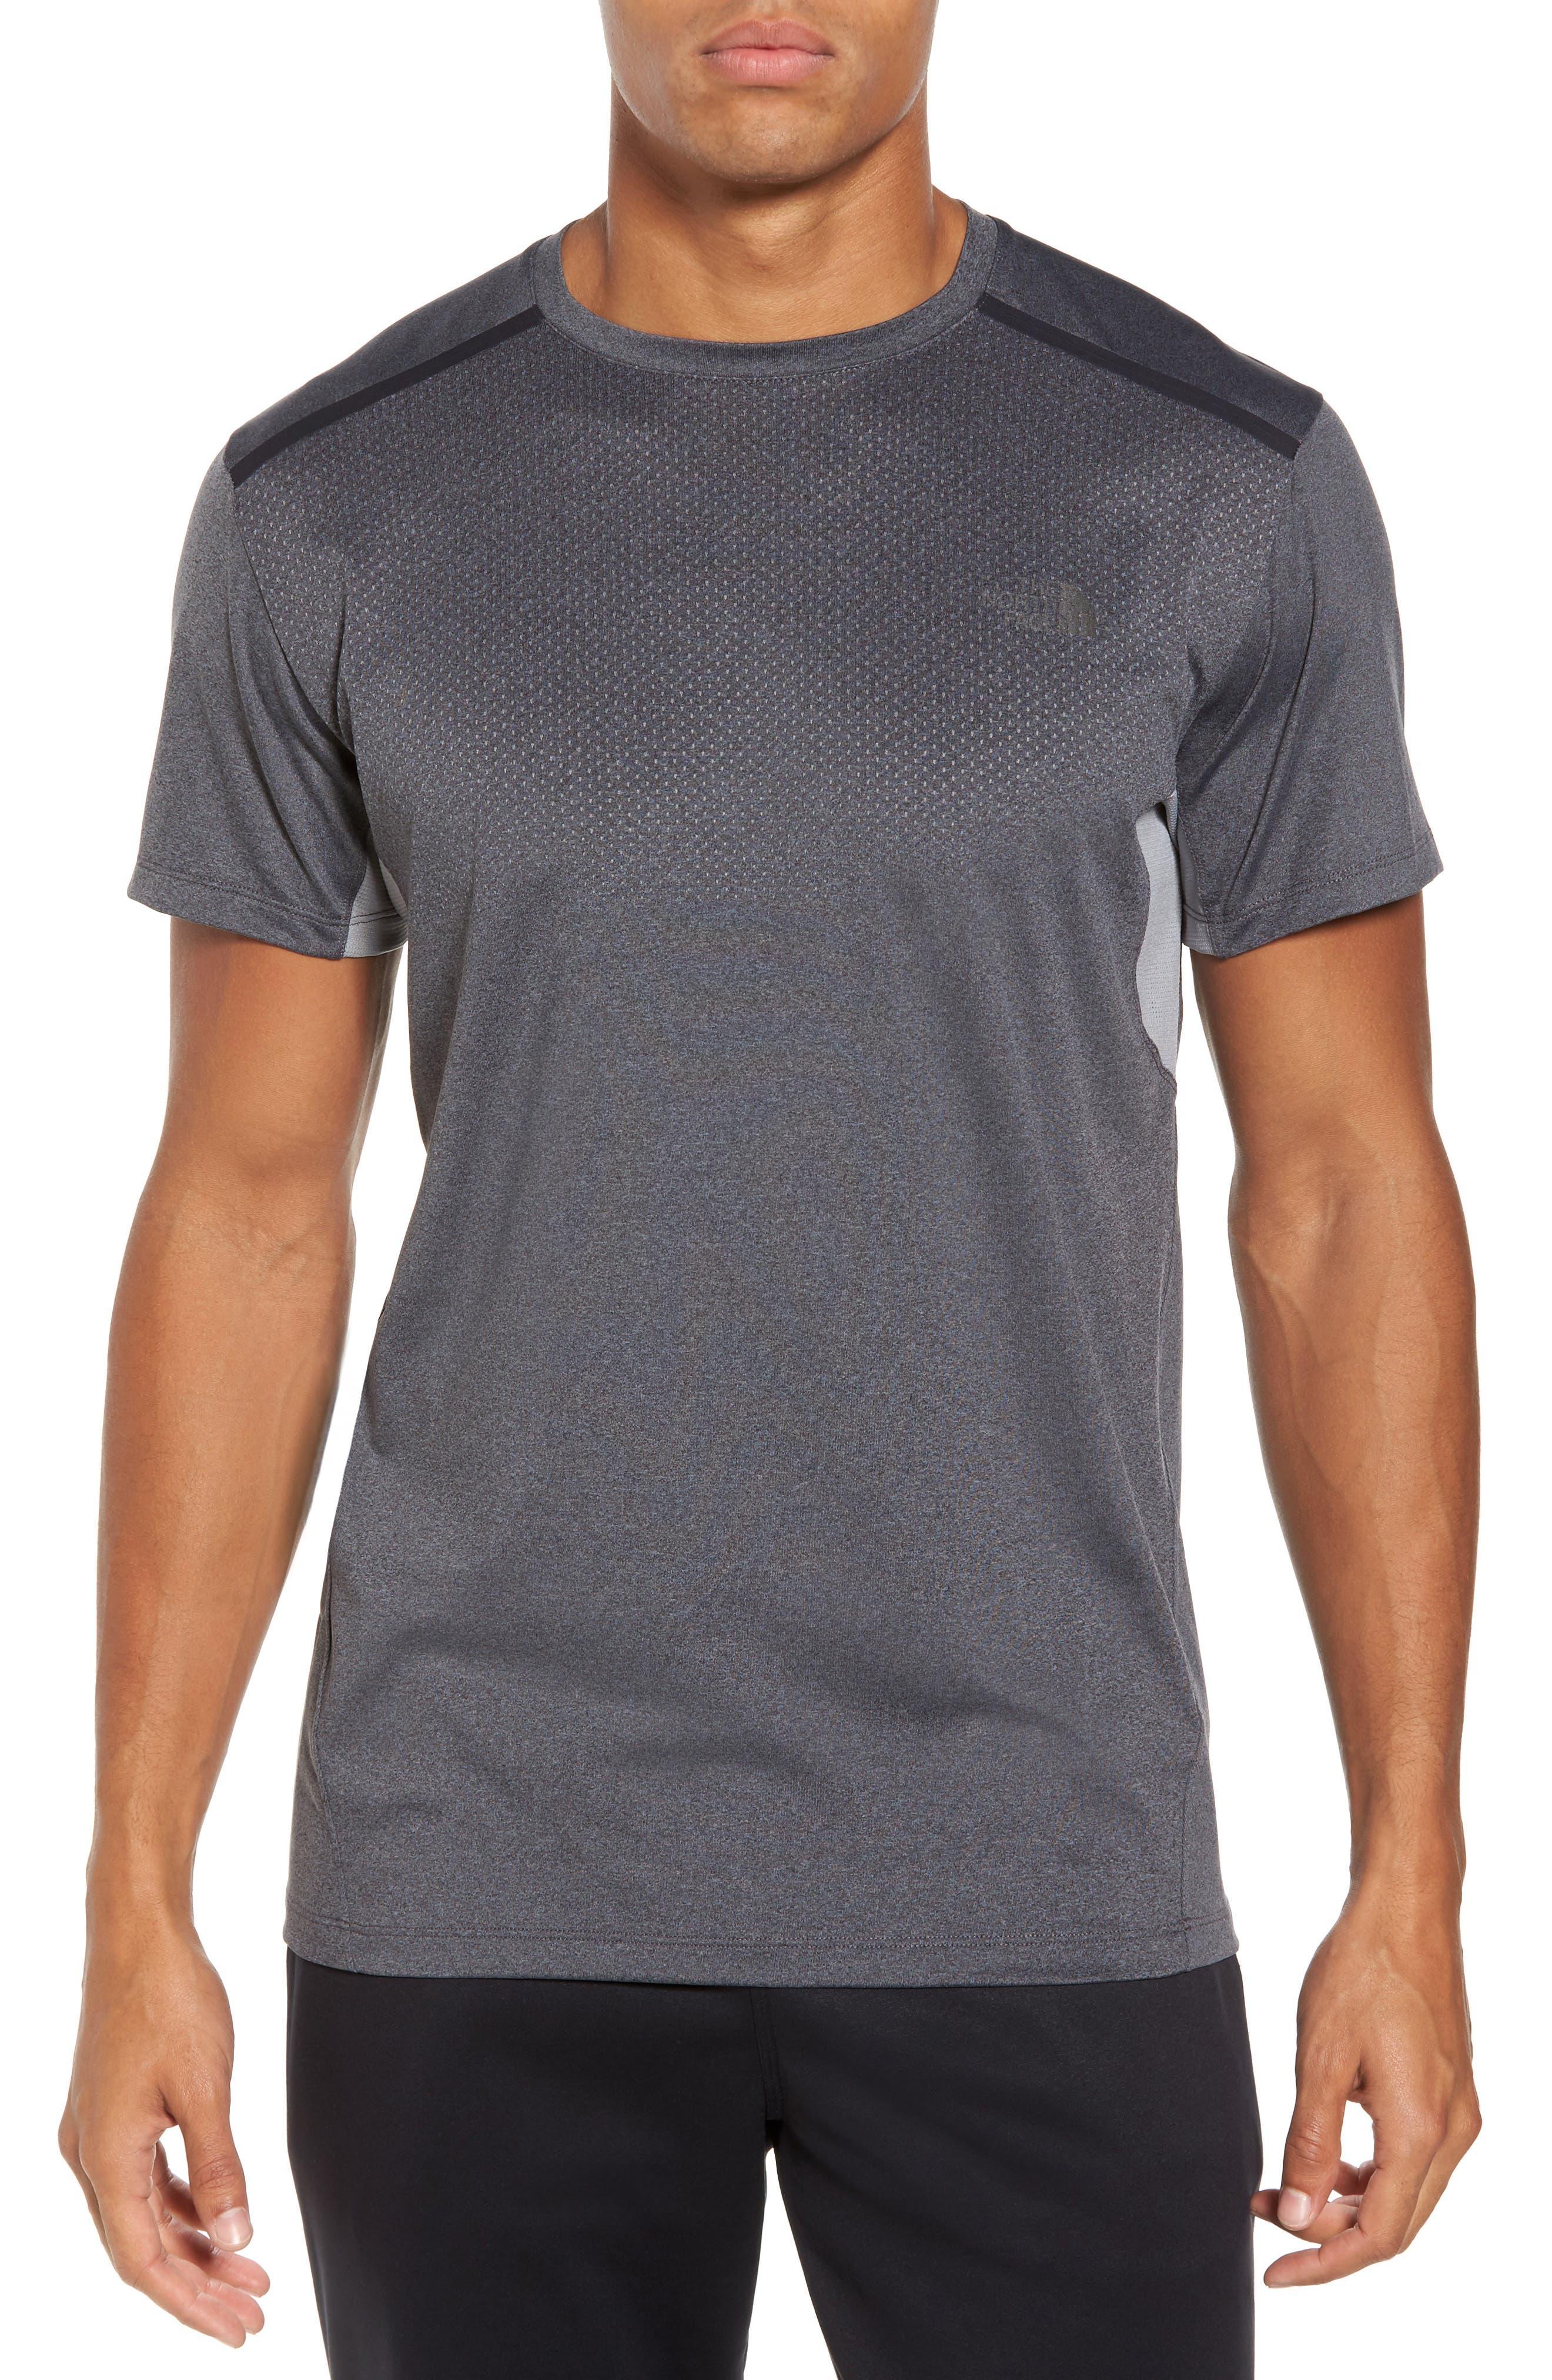 Main Image - The North Face 'Kilowatt' Performance T-Shirt